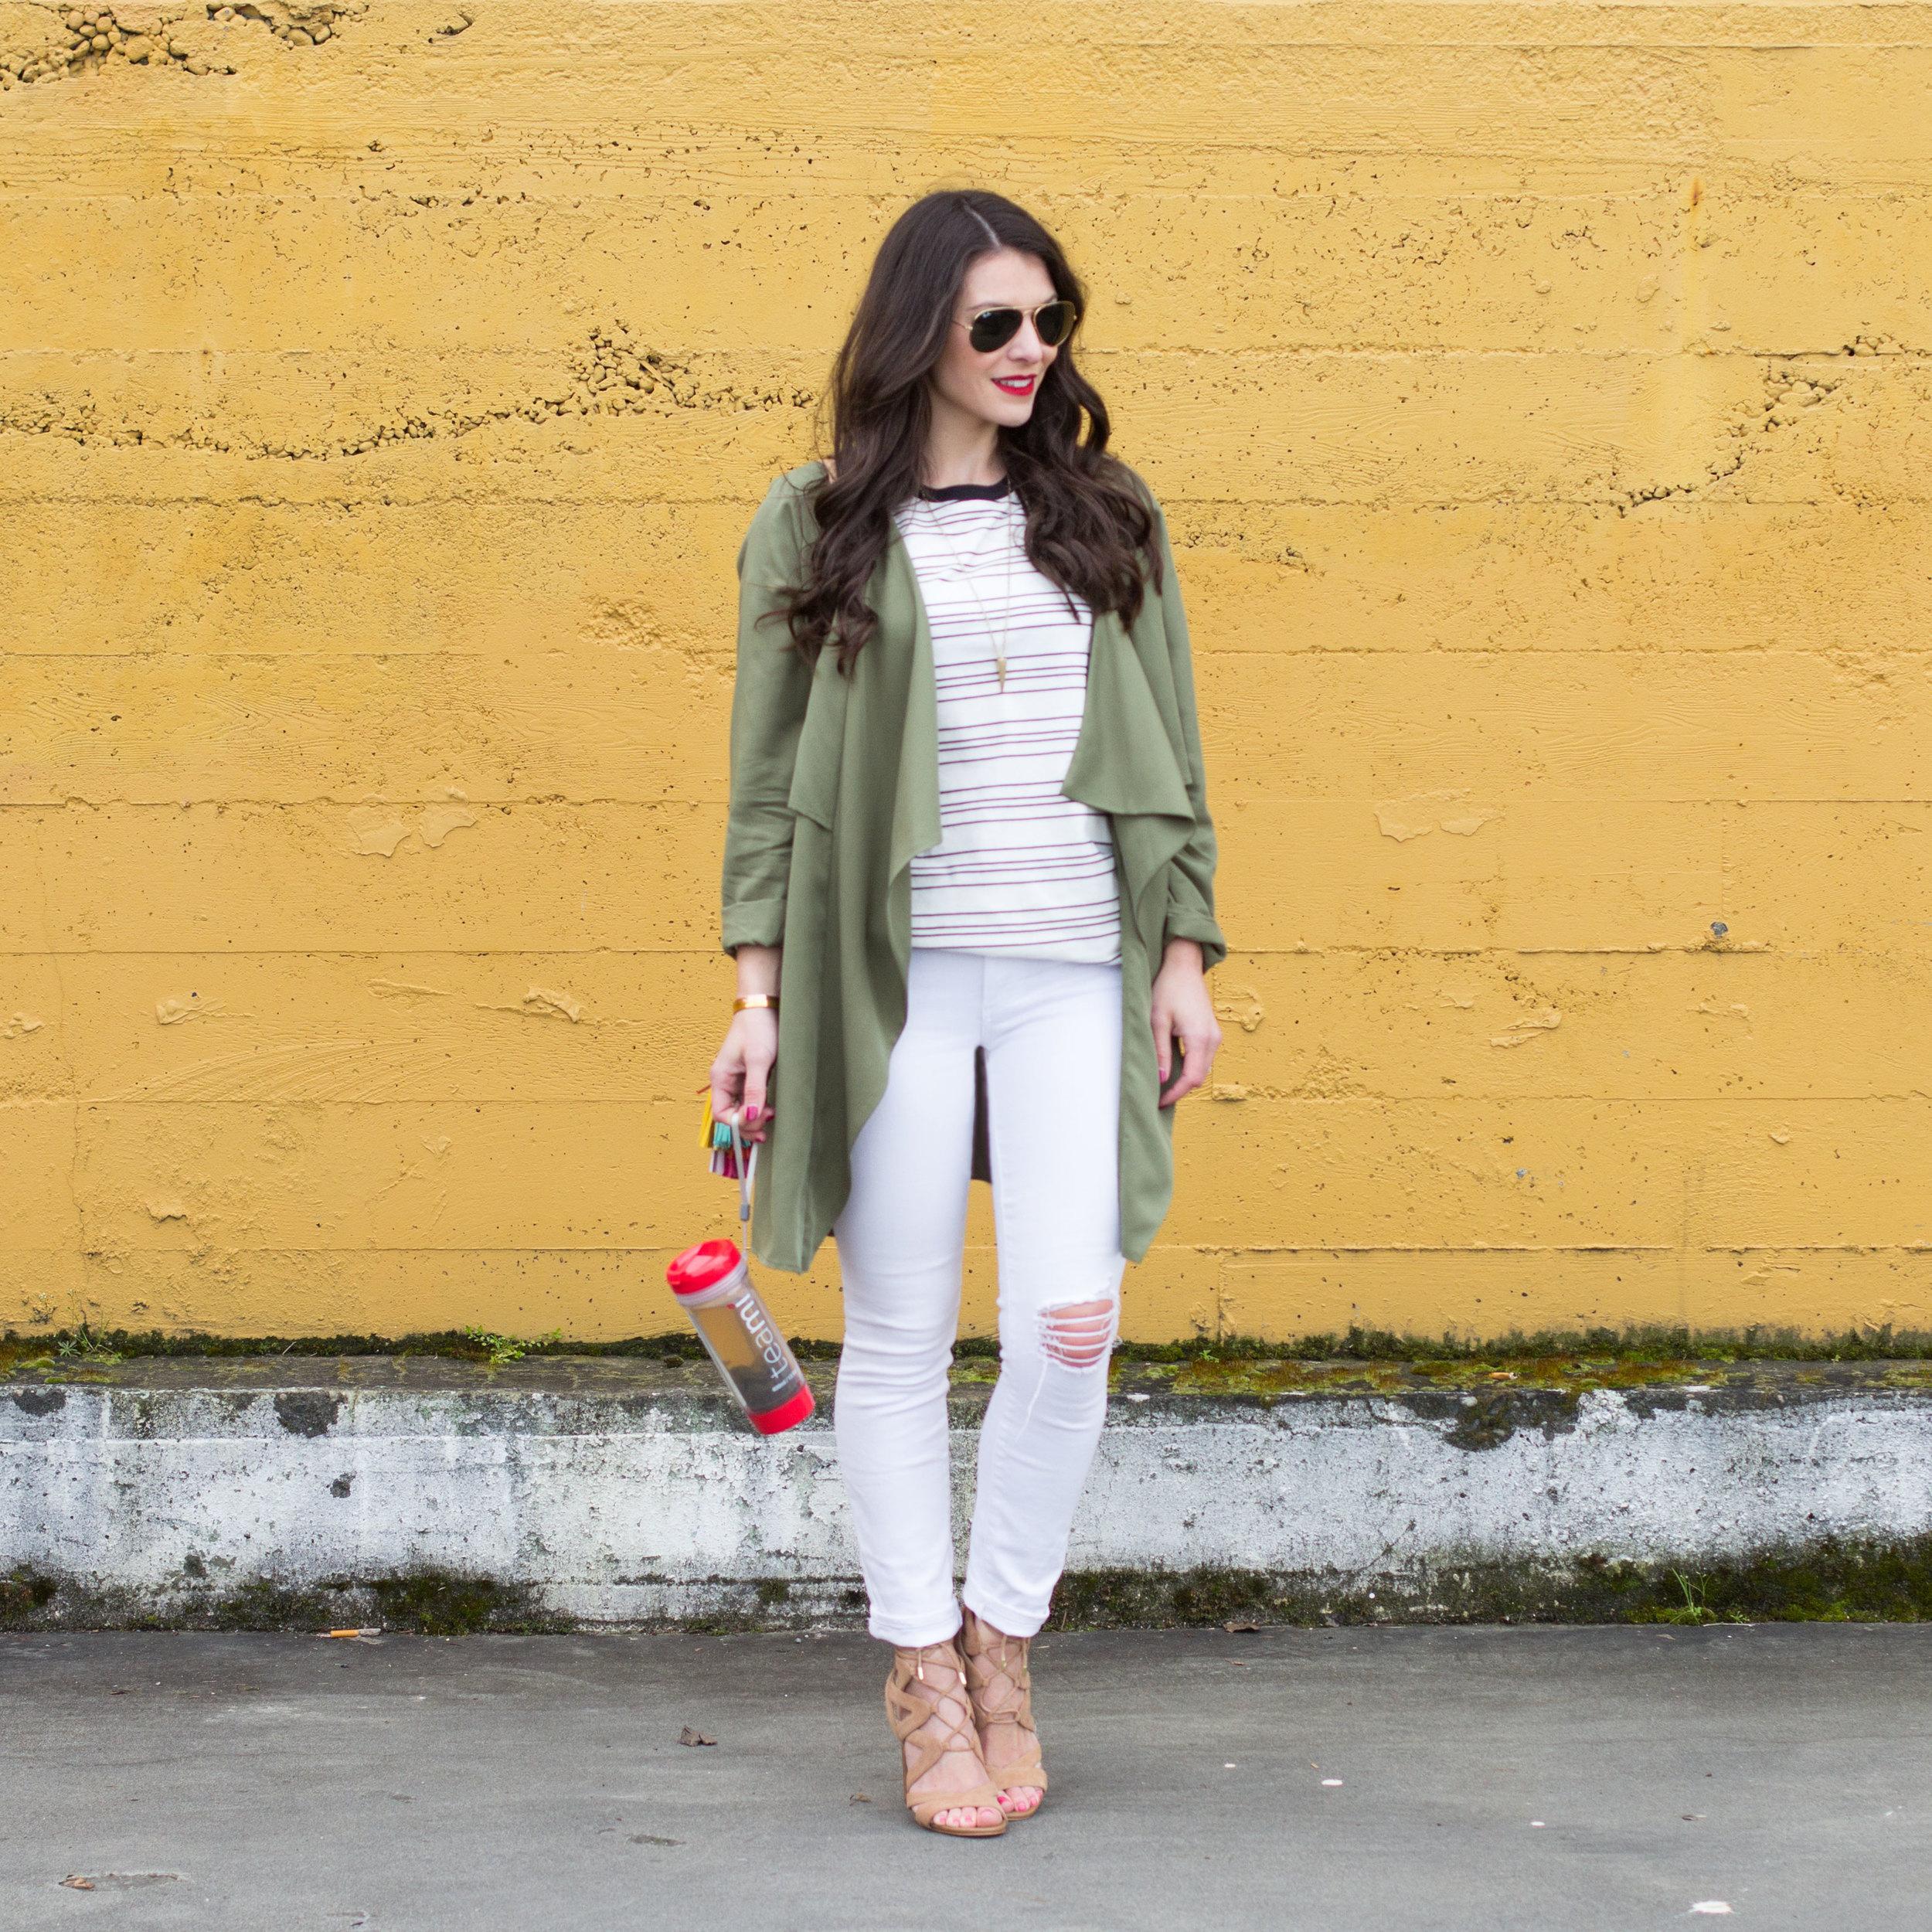 Spring Outfit, White Skinny Jeans, Green Drape Jacket, Stripe Tee, Sam Edelman Yardley Sandals.